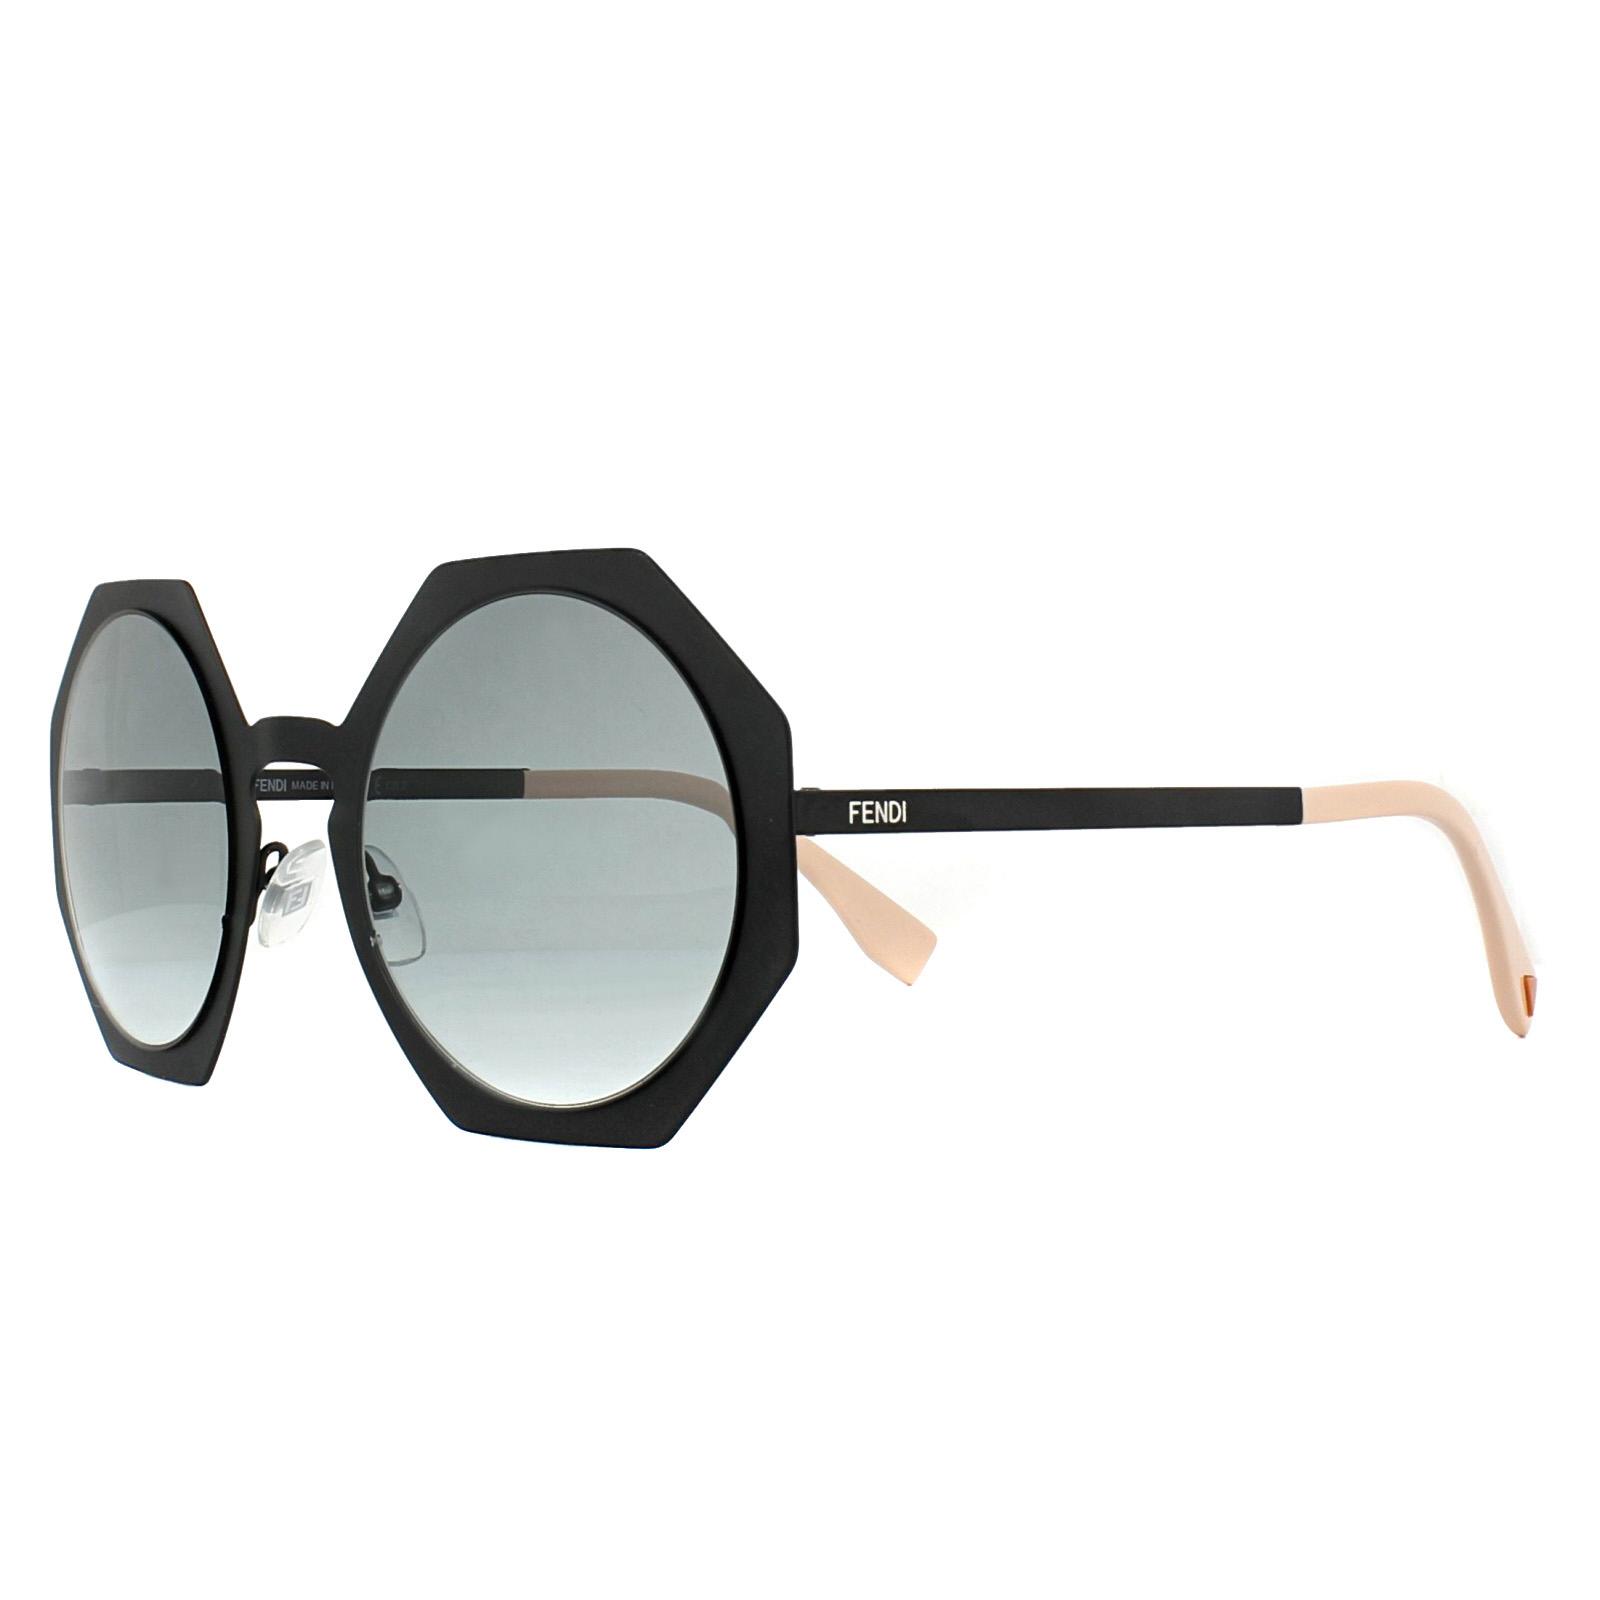 cff77eac3f26 Sentinel Fendi Sunglasses Facets FF 0152/S 003 JJ Matt Black Grey Gradient